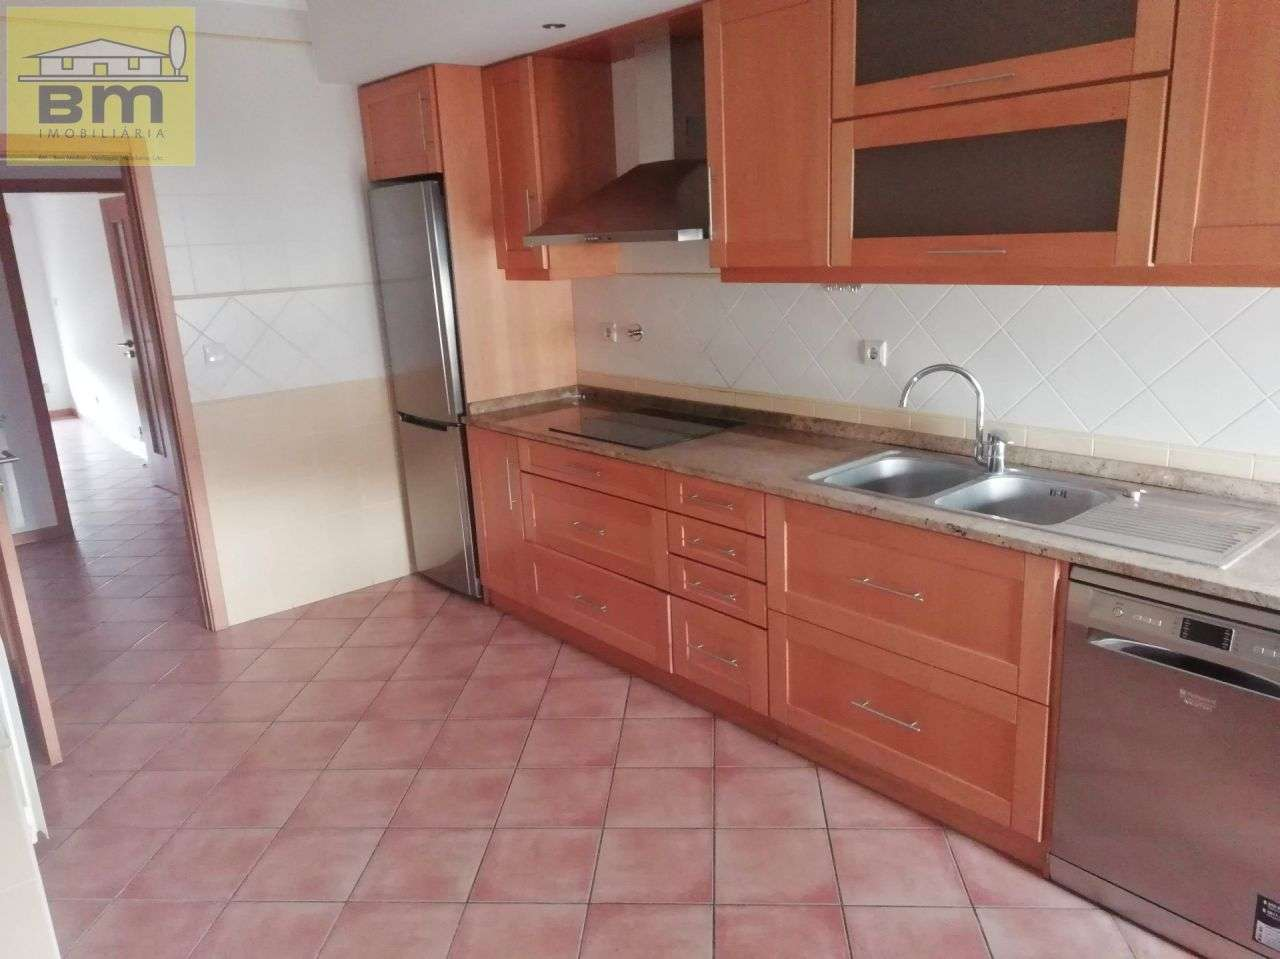 Apartamento para arrendar, Almaceda, Castelo Branco - Foto 1